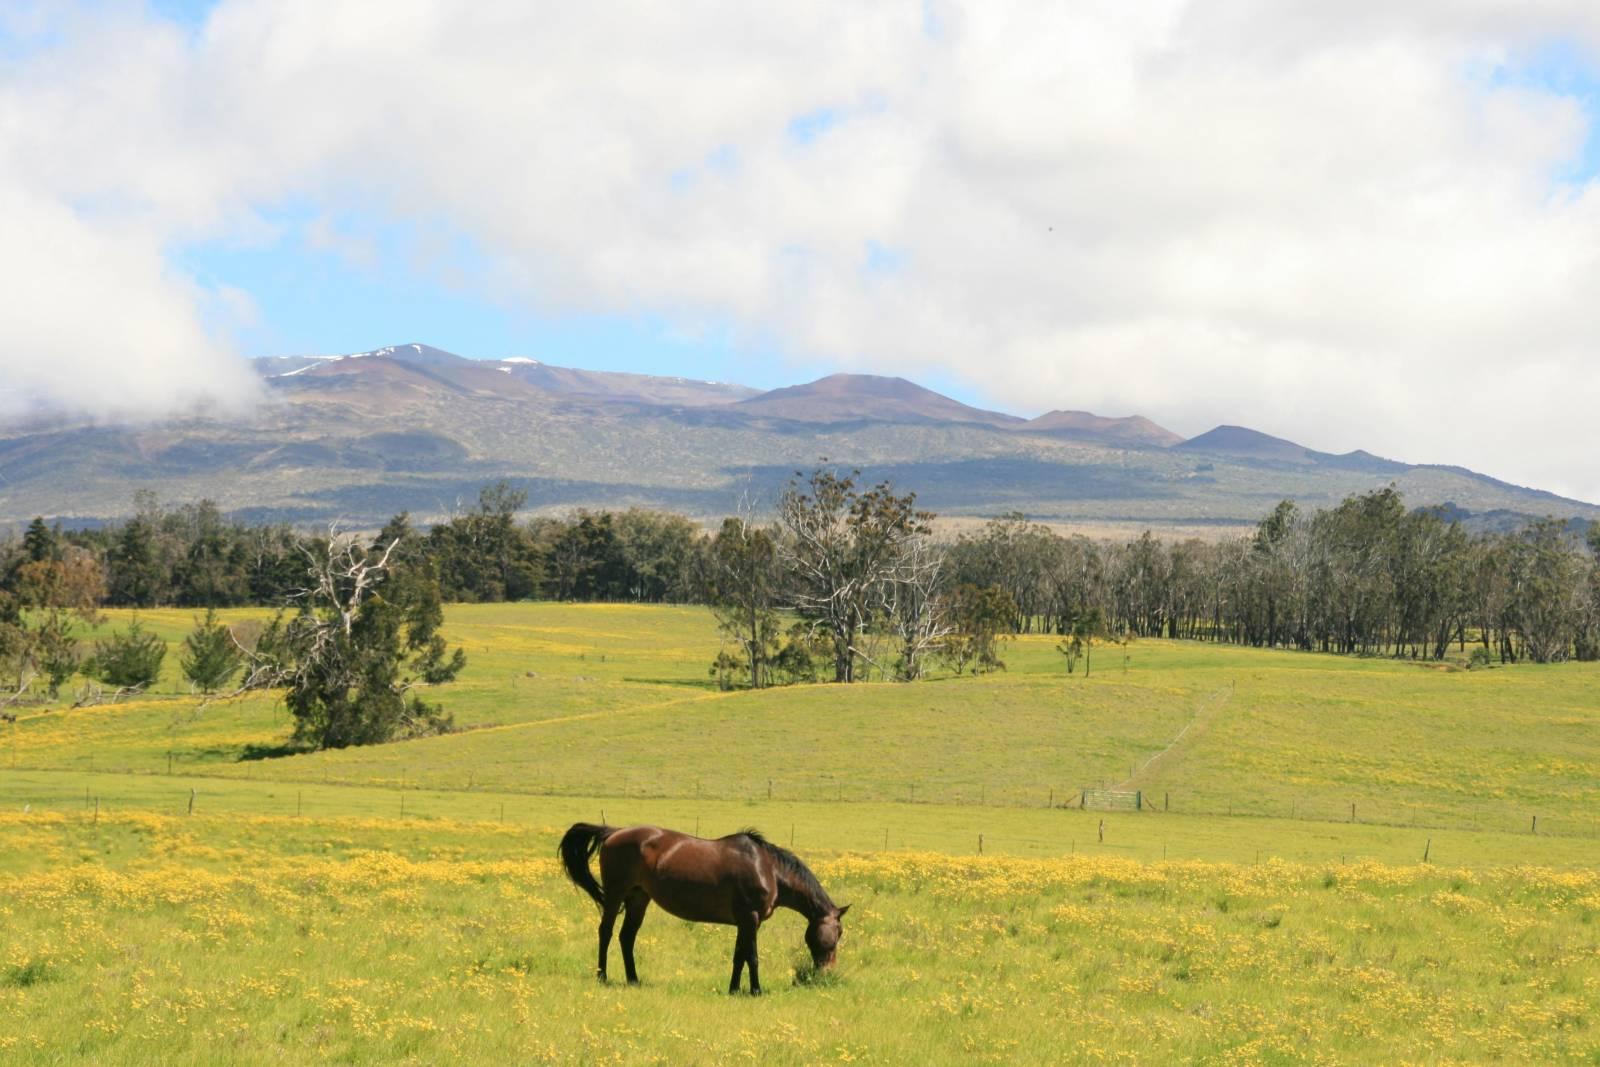 Waikii Ranch horse properties